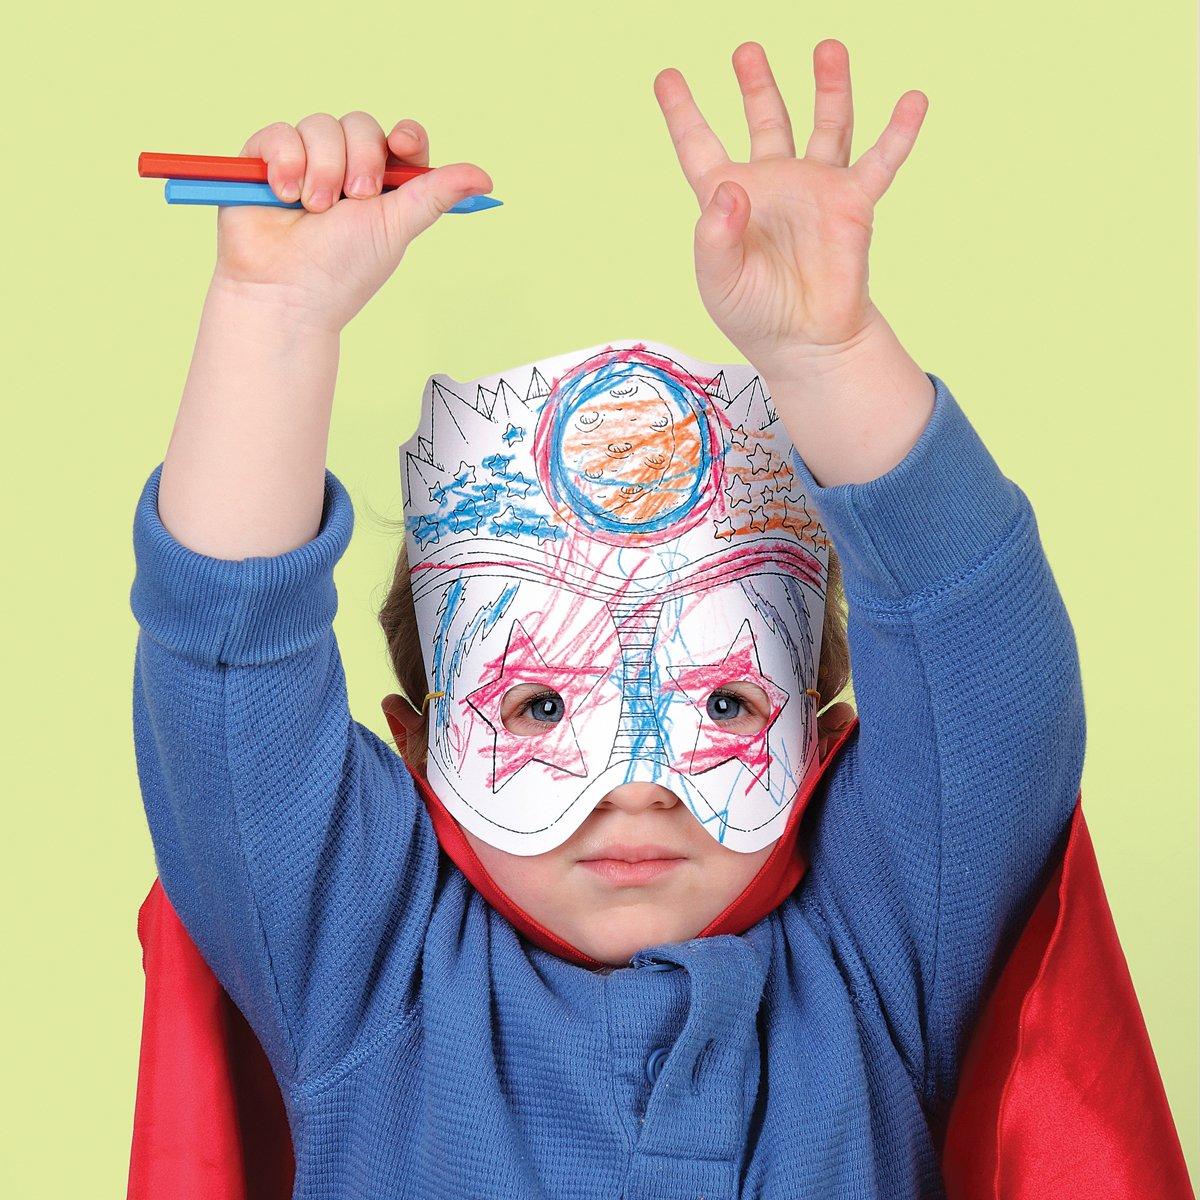 Amazon.com: Mudpuppy Superheros Make-a-Mask: Mudpuppy, Stephan Britt: Toys & Games